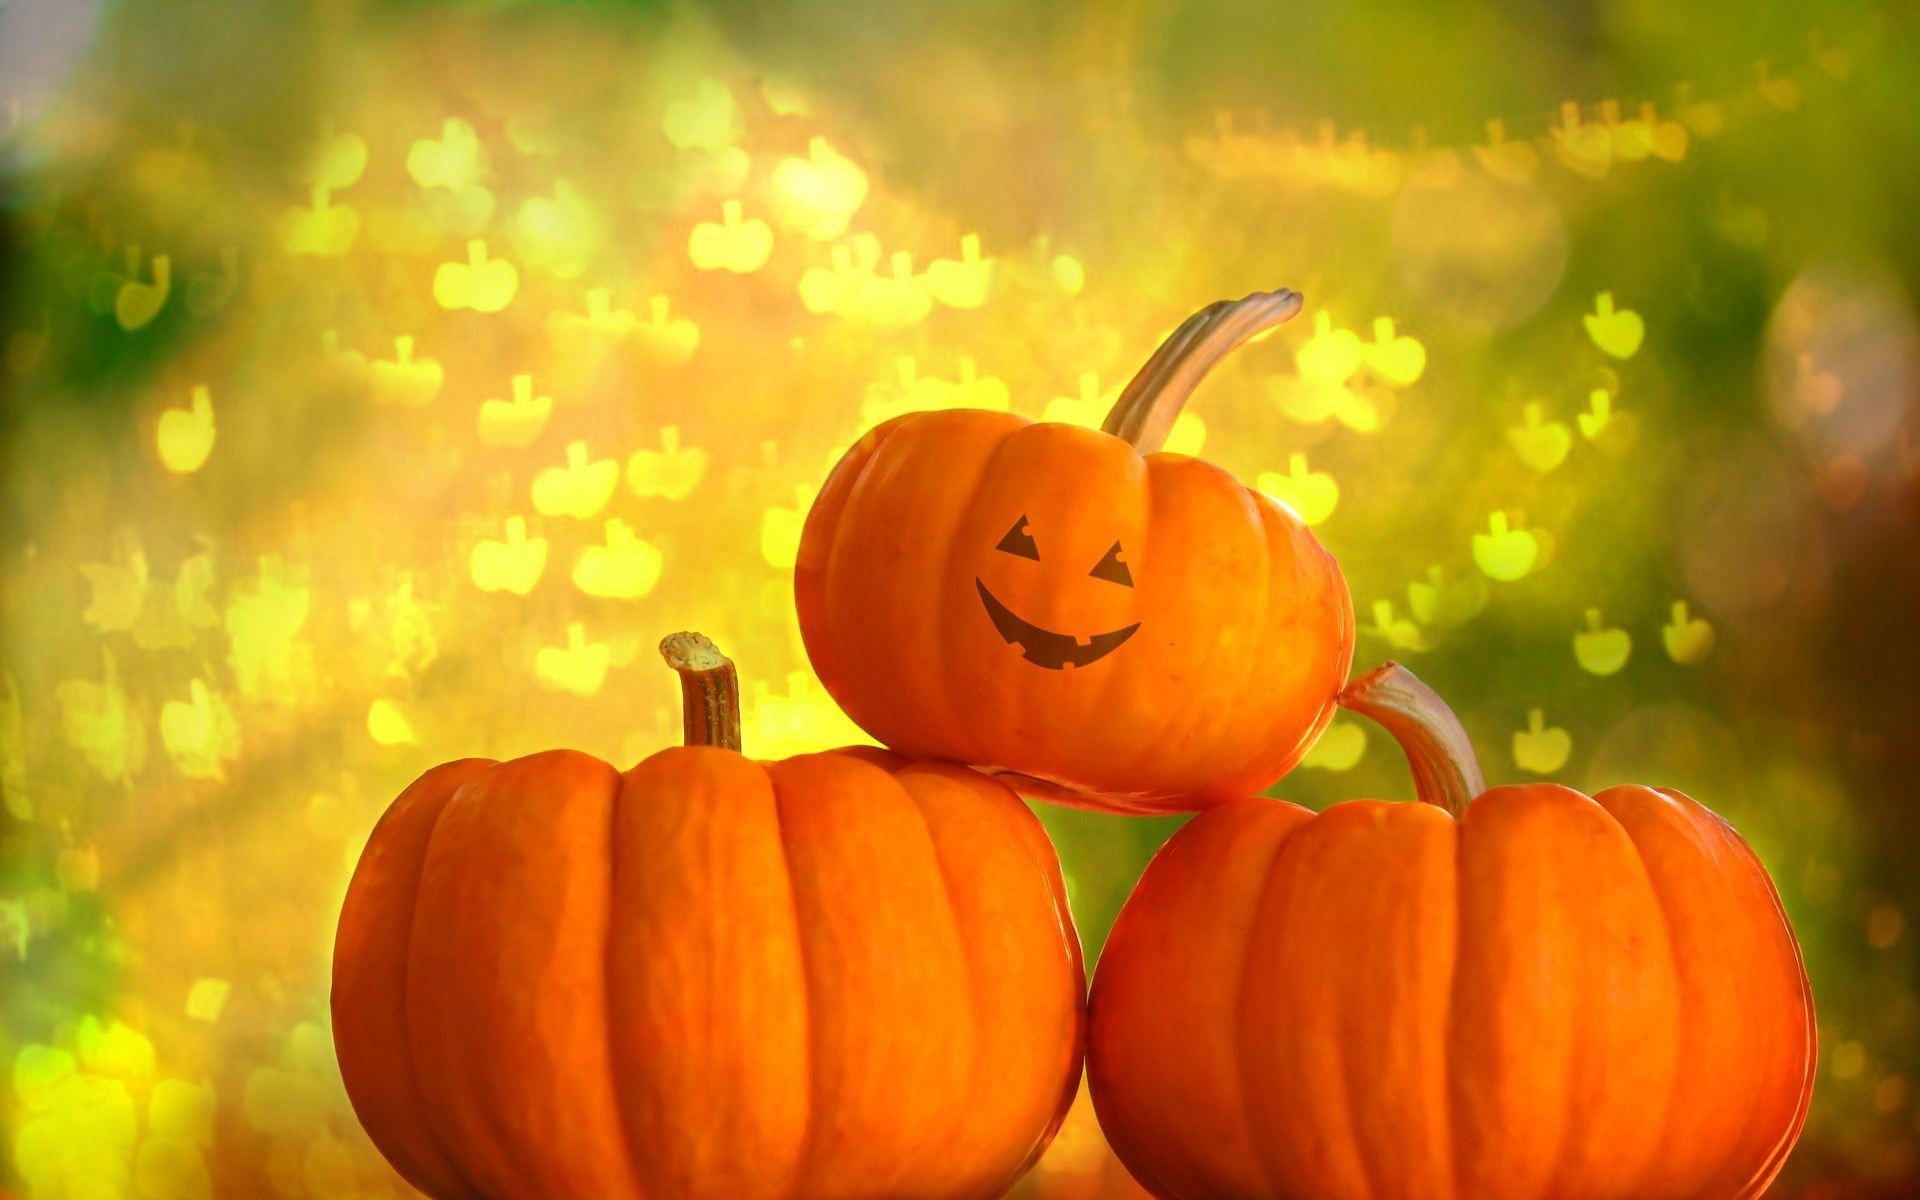 halloween pumpkins desktop wallpaper wallpapersafari halloween pumpkins desktop wallpaper wallpapersafari